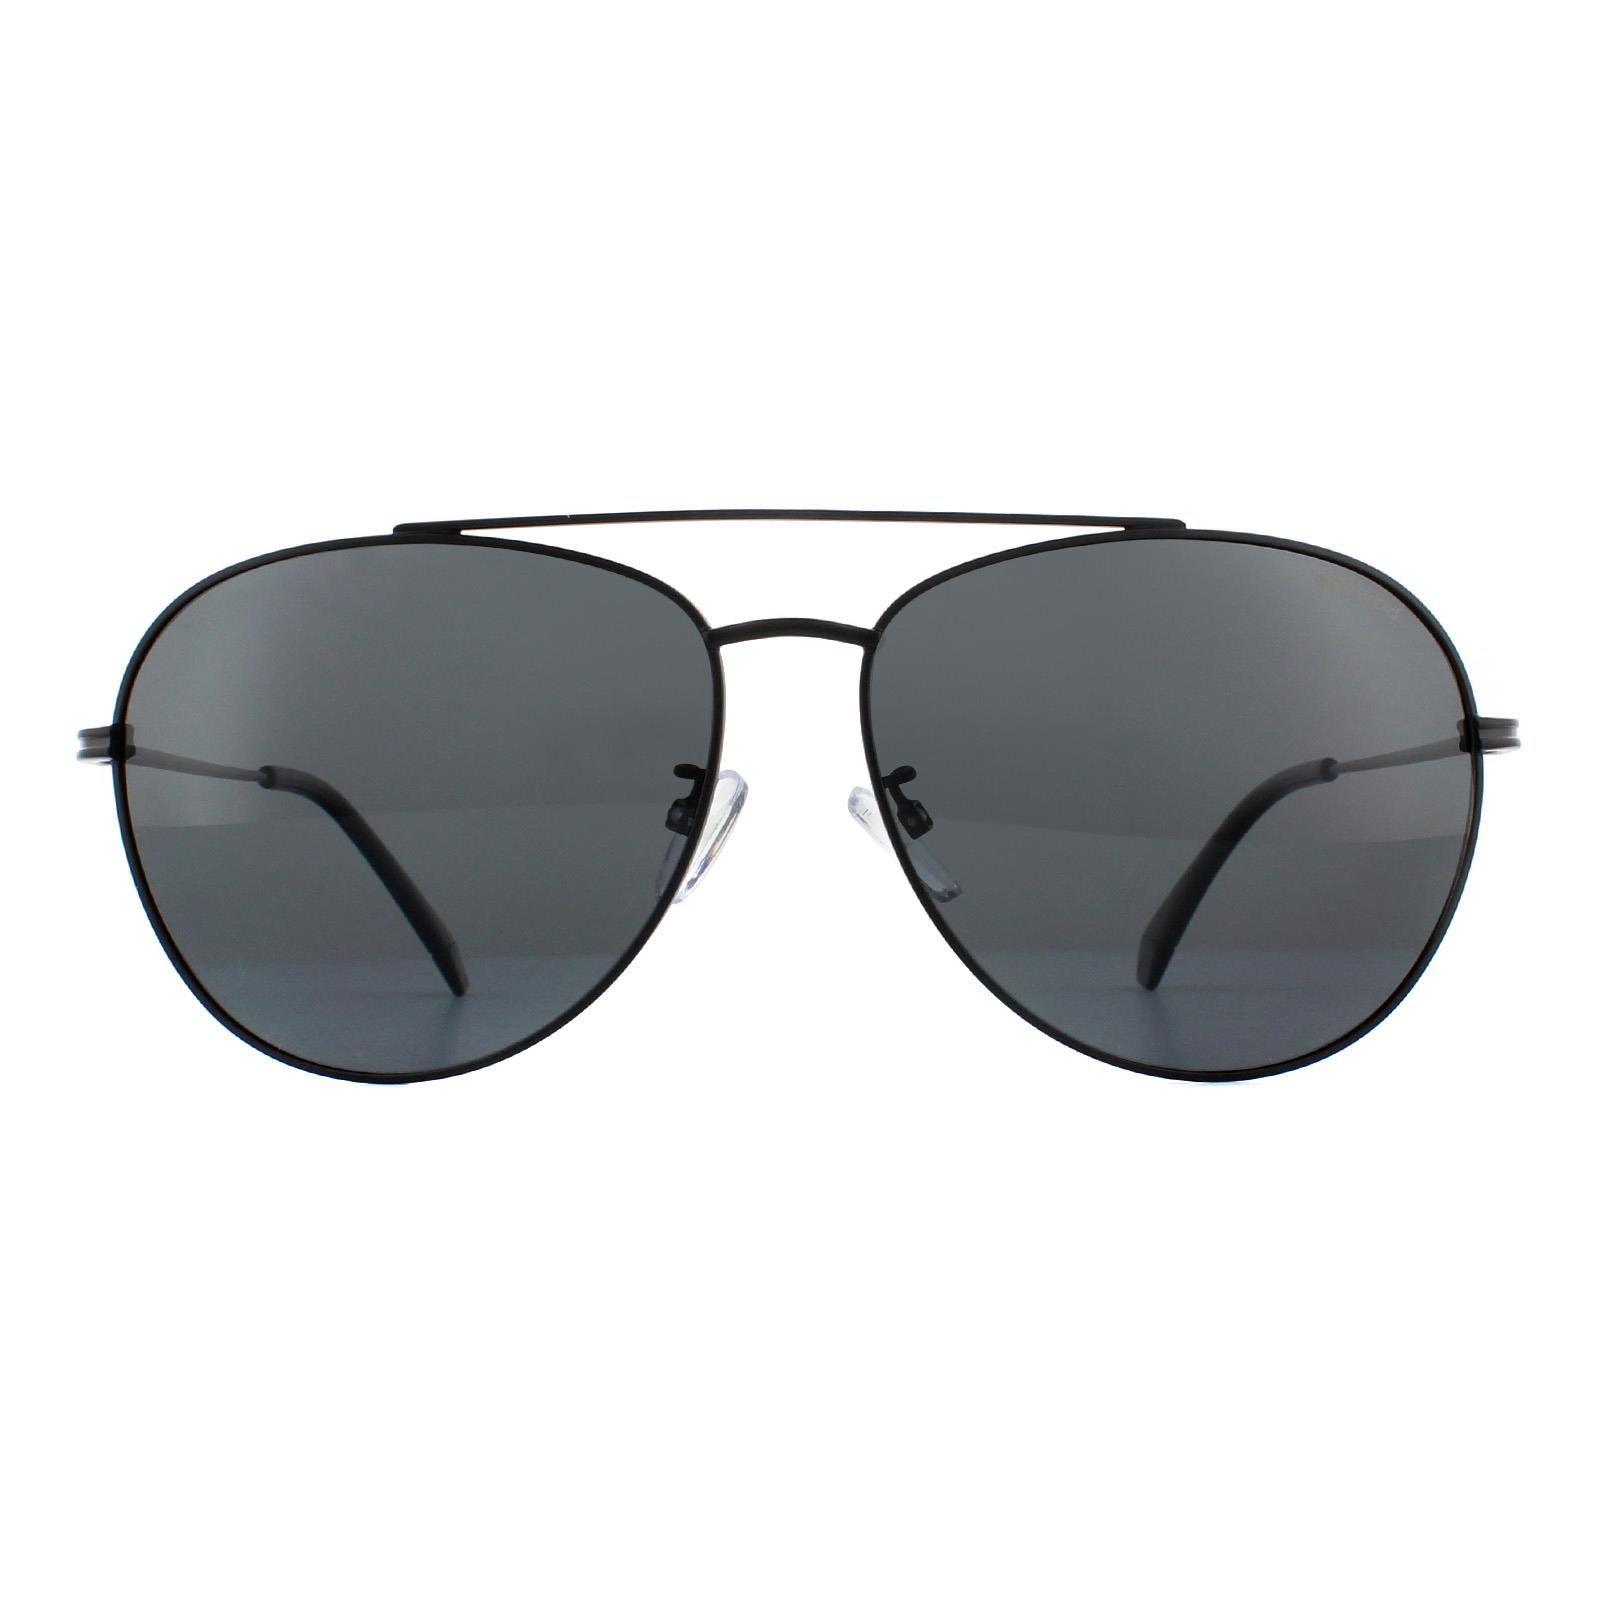 Polaroid Sunglasses PLD 2083/G/S 807 M9 Black Grey Polarized